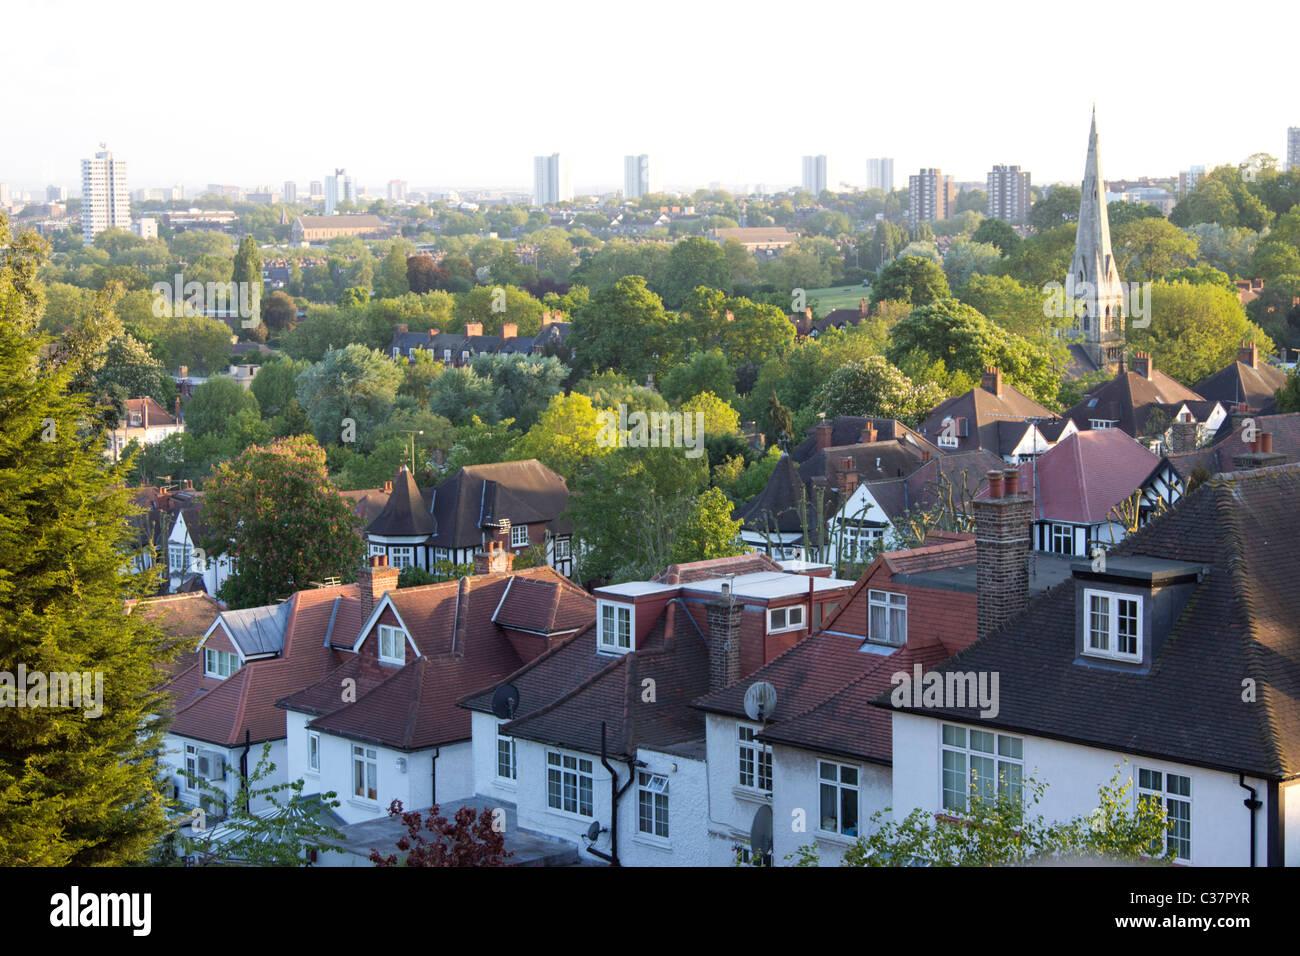 Holly Lodge Estate - Highgate - Camden - London - Stock Image